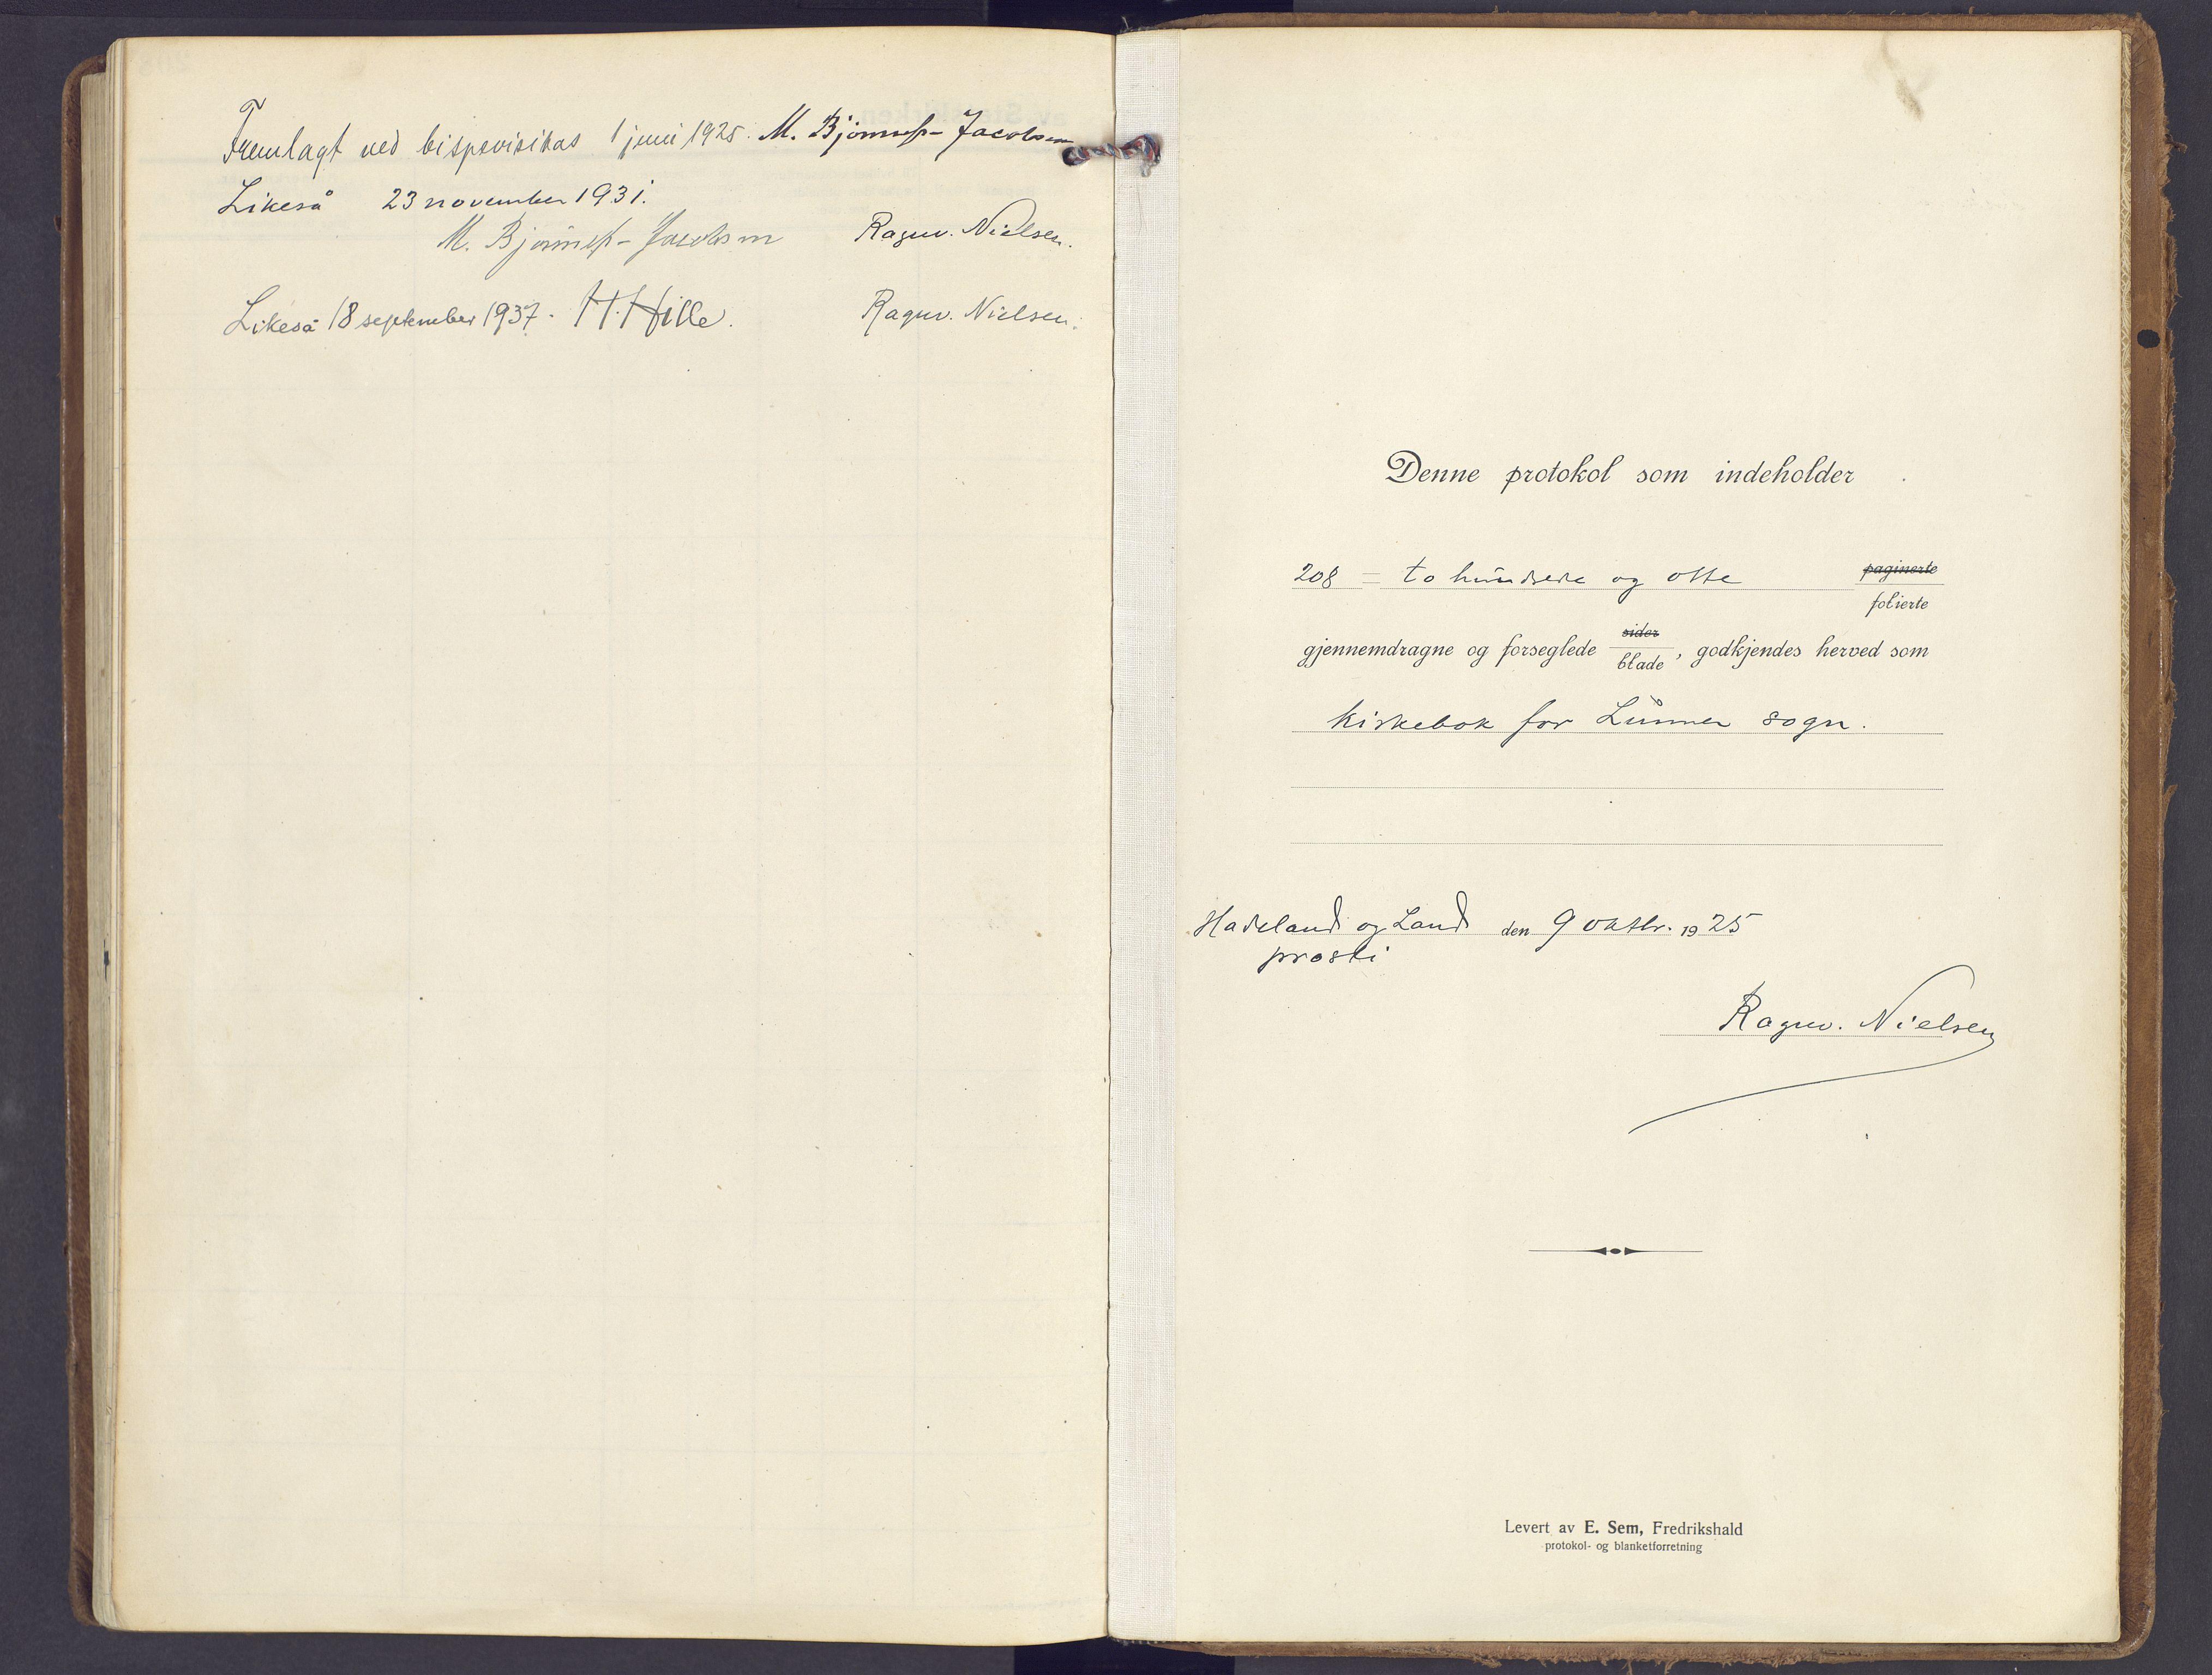 SAH, Lunner prestekontor, H/Ha/Haa/L0002: Ministerialbok nr. 2, 1922-1931